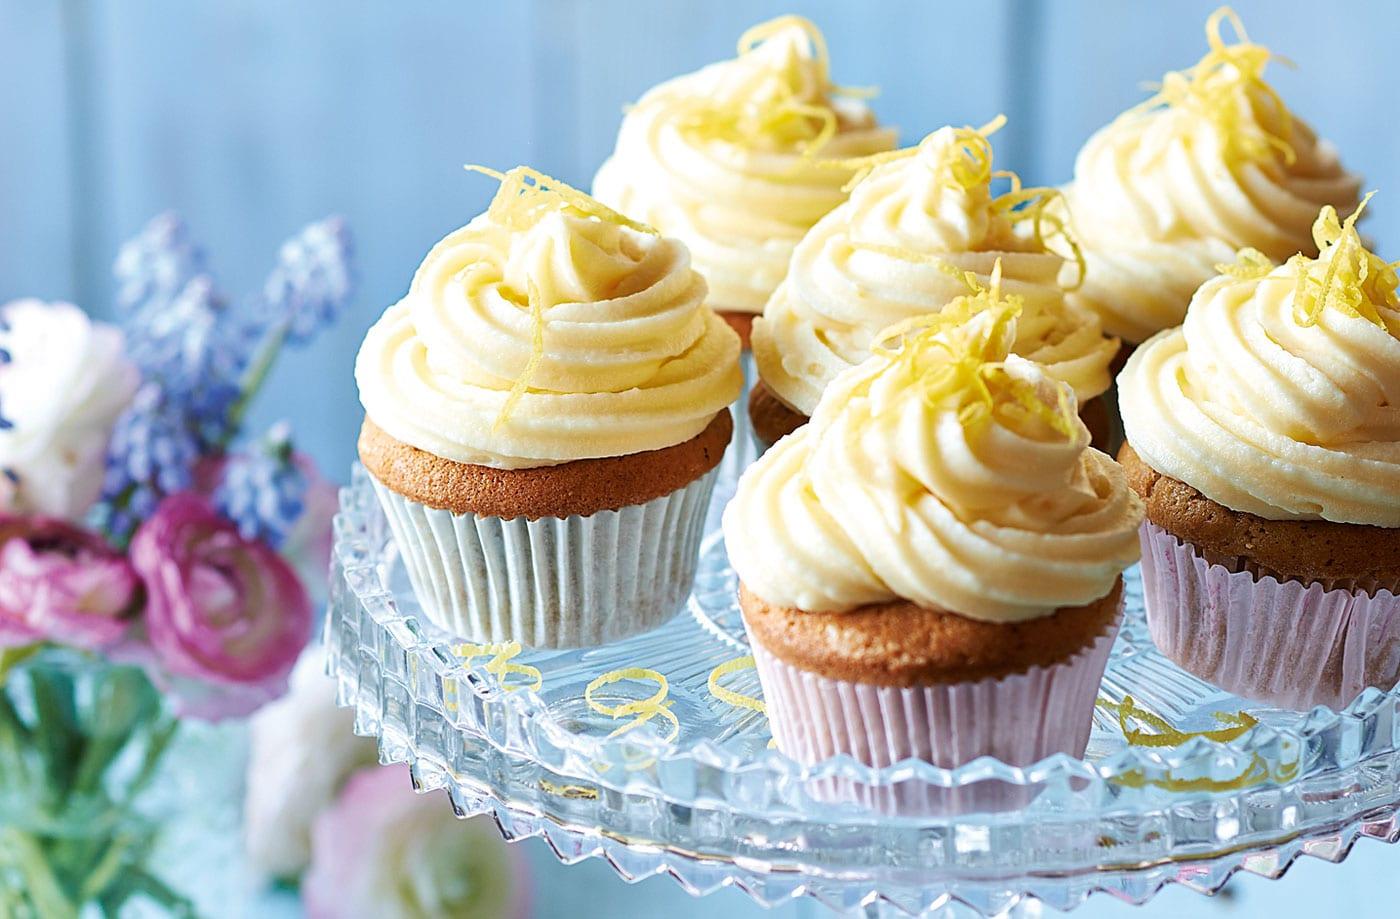 Earl Grey cupcakes LGH 2d9731d9 30cf 4856 8793 4ab44a94dca3 0 1400x919